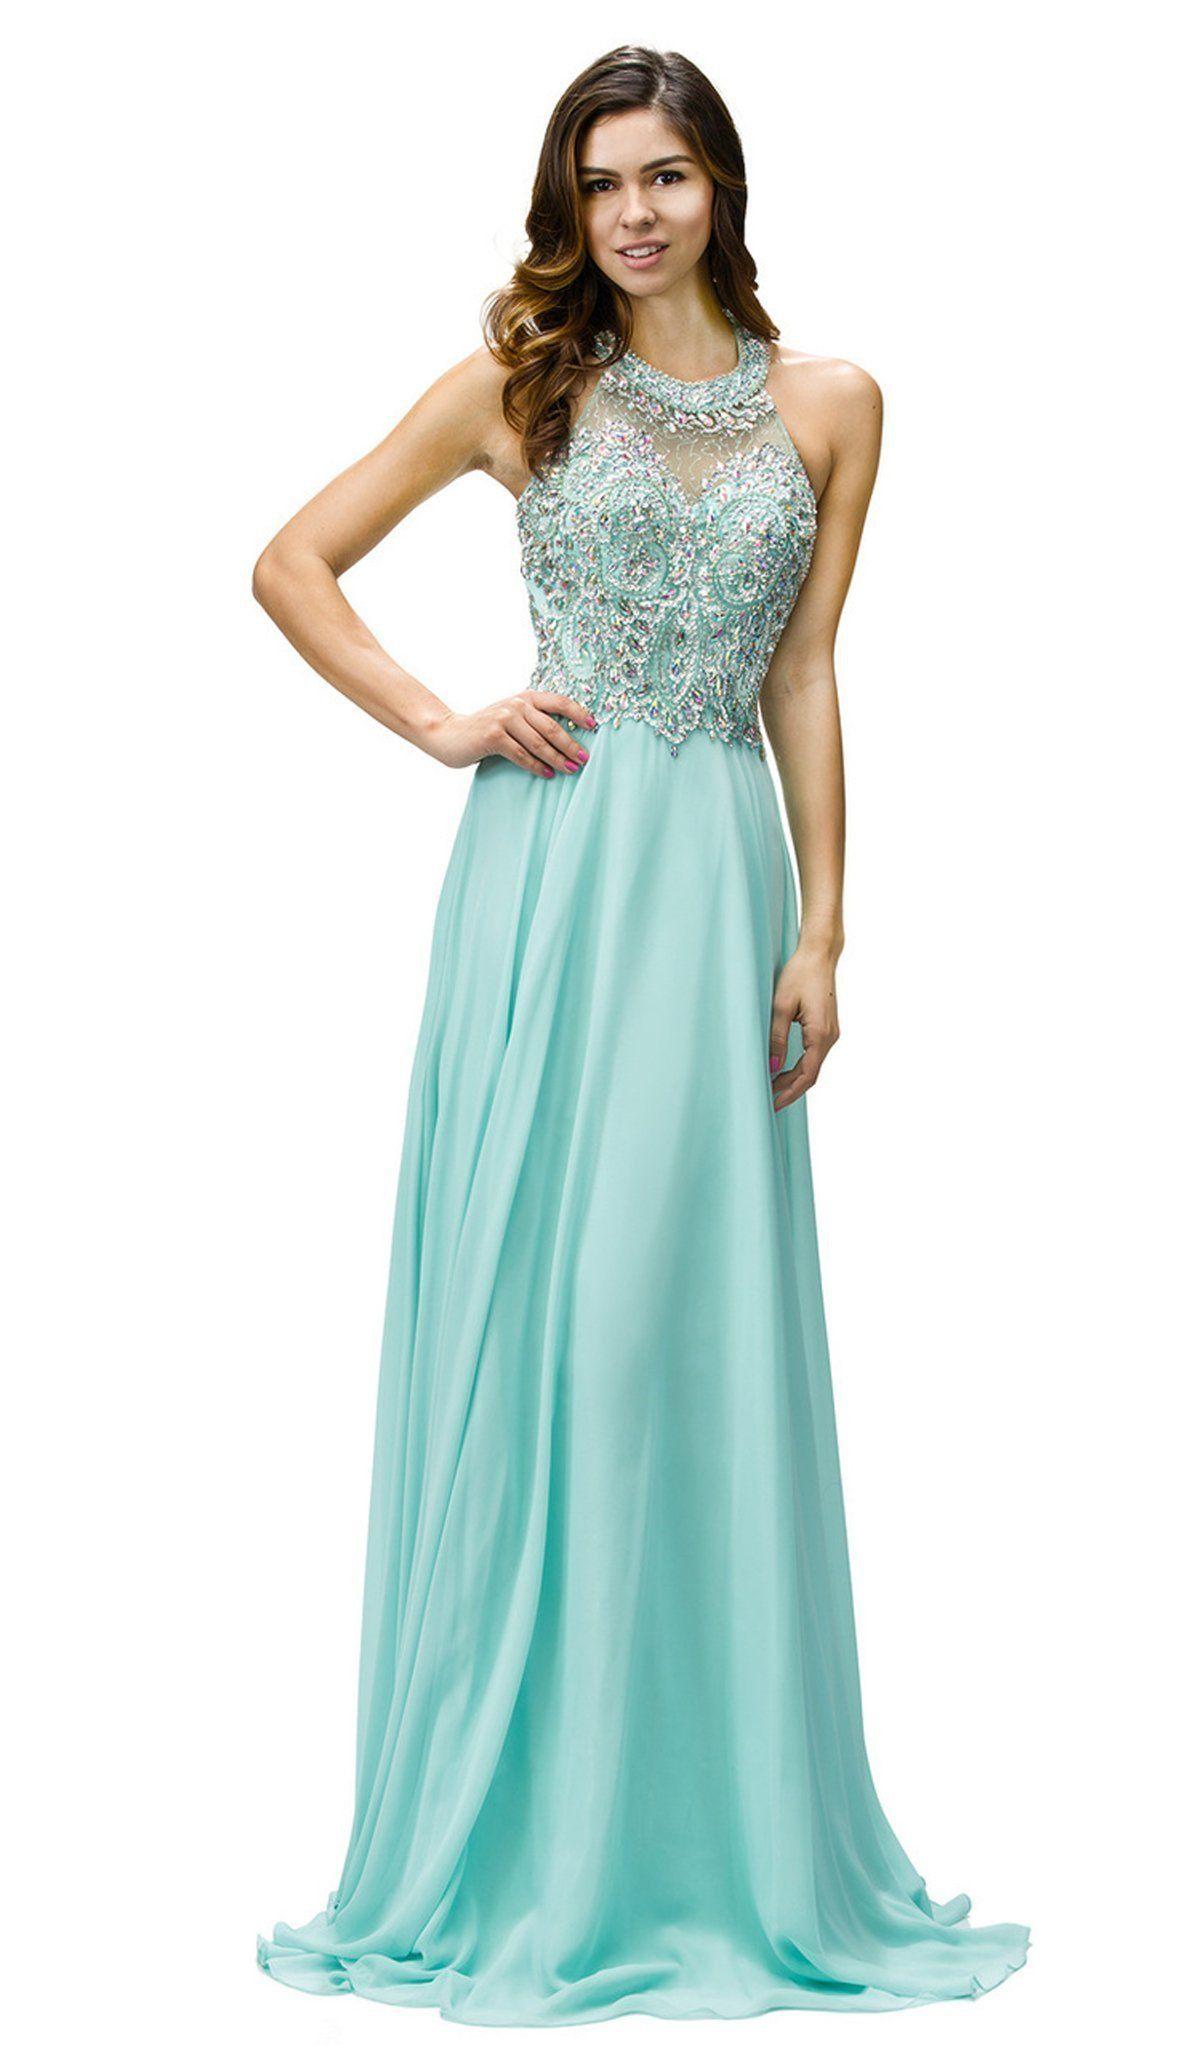 Dancing Queen 9233 Jewel Adorned Illusion Chiffon Prom Dress In 2020 Chiffon Prom Dress Prom Dresses Dresses [ 2048 x 1200 Pixel ]